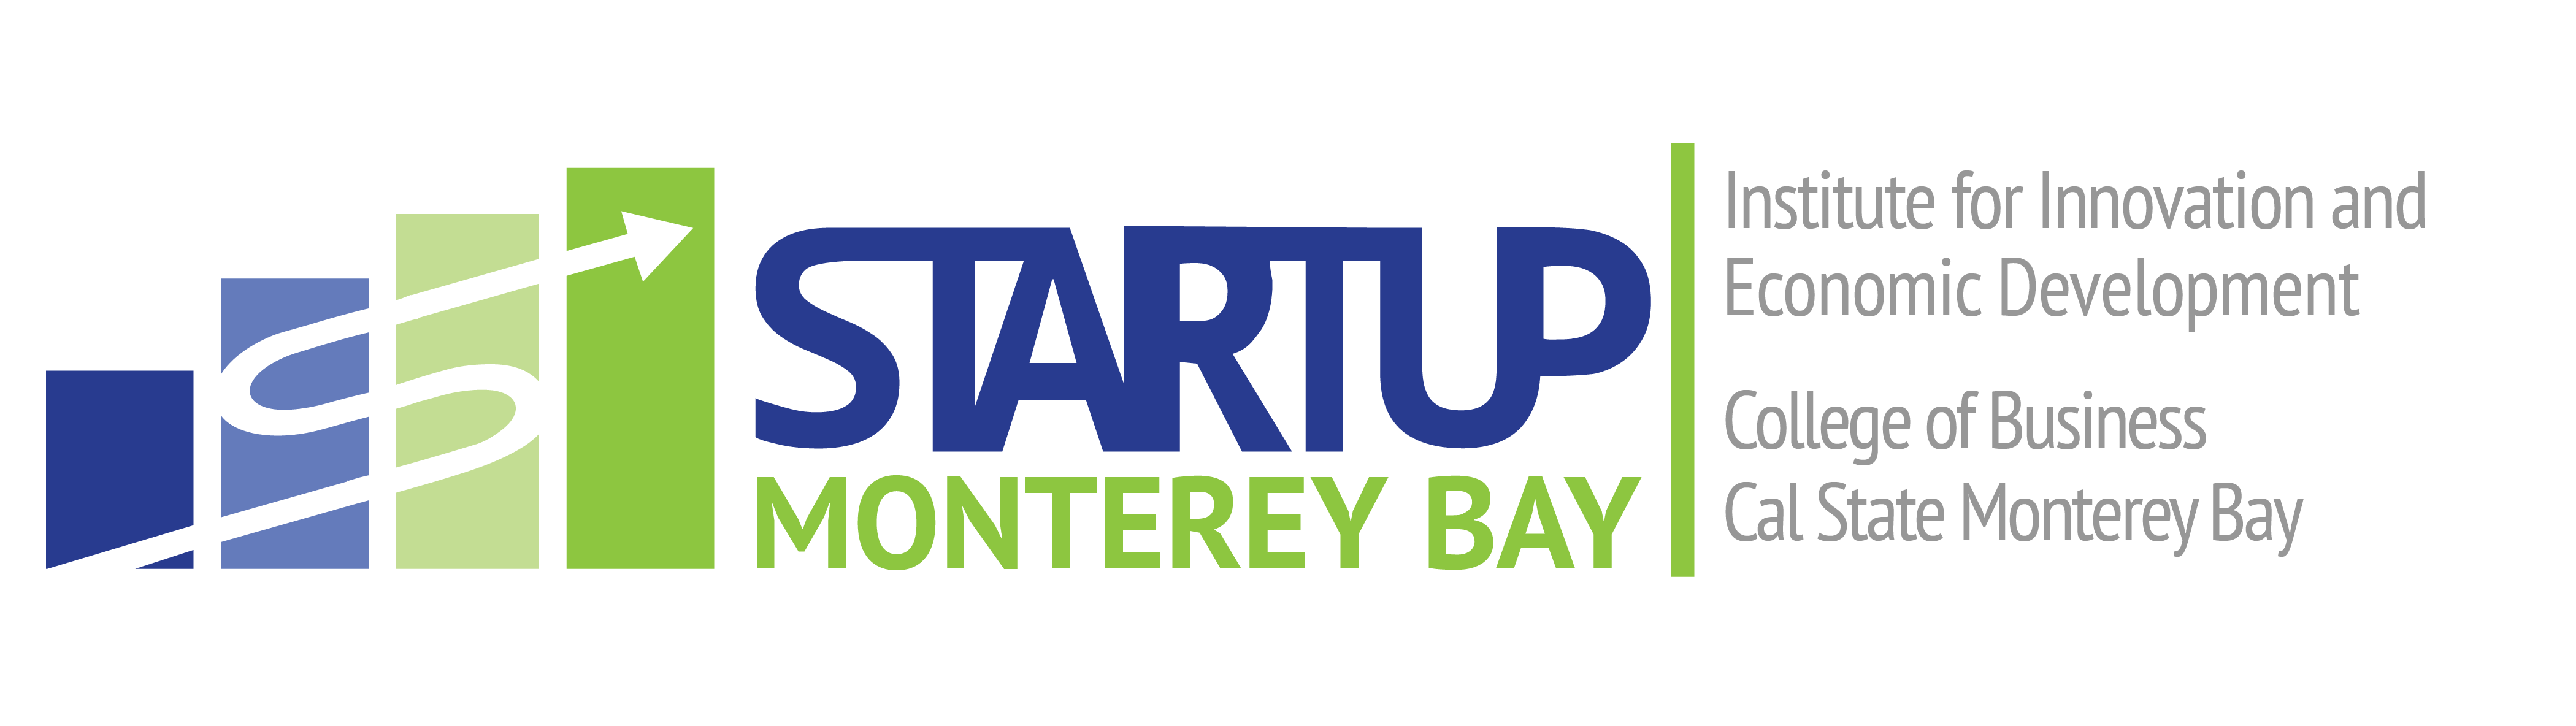 Startup Monterey Bay Logo